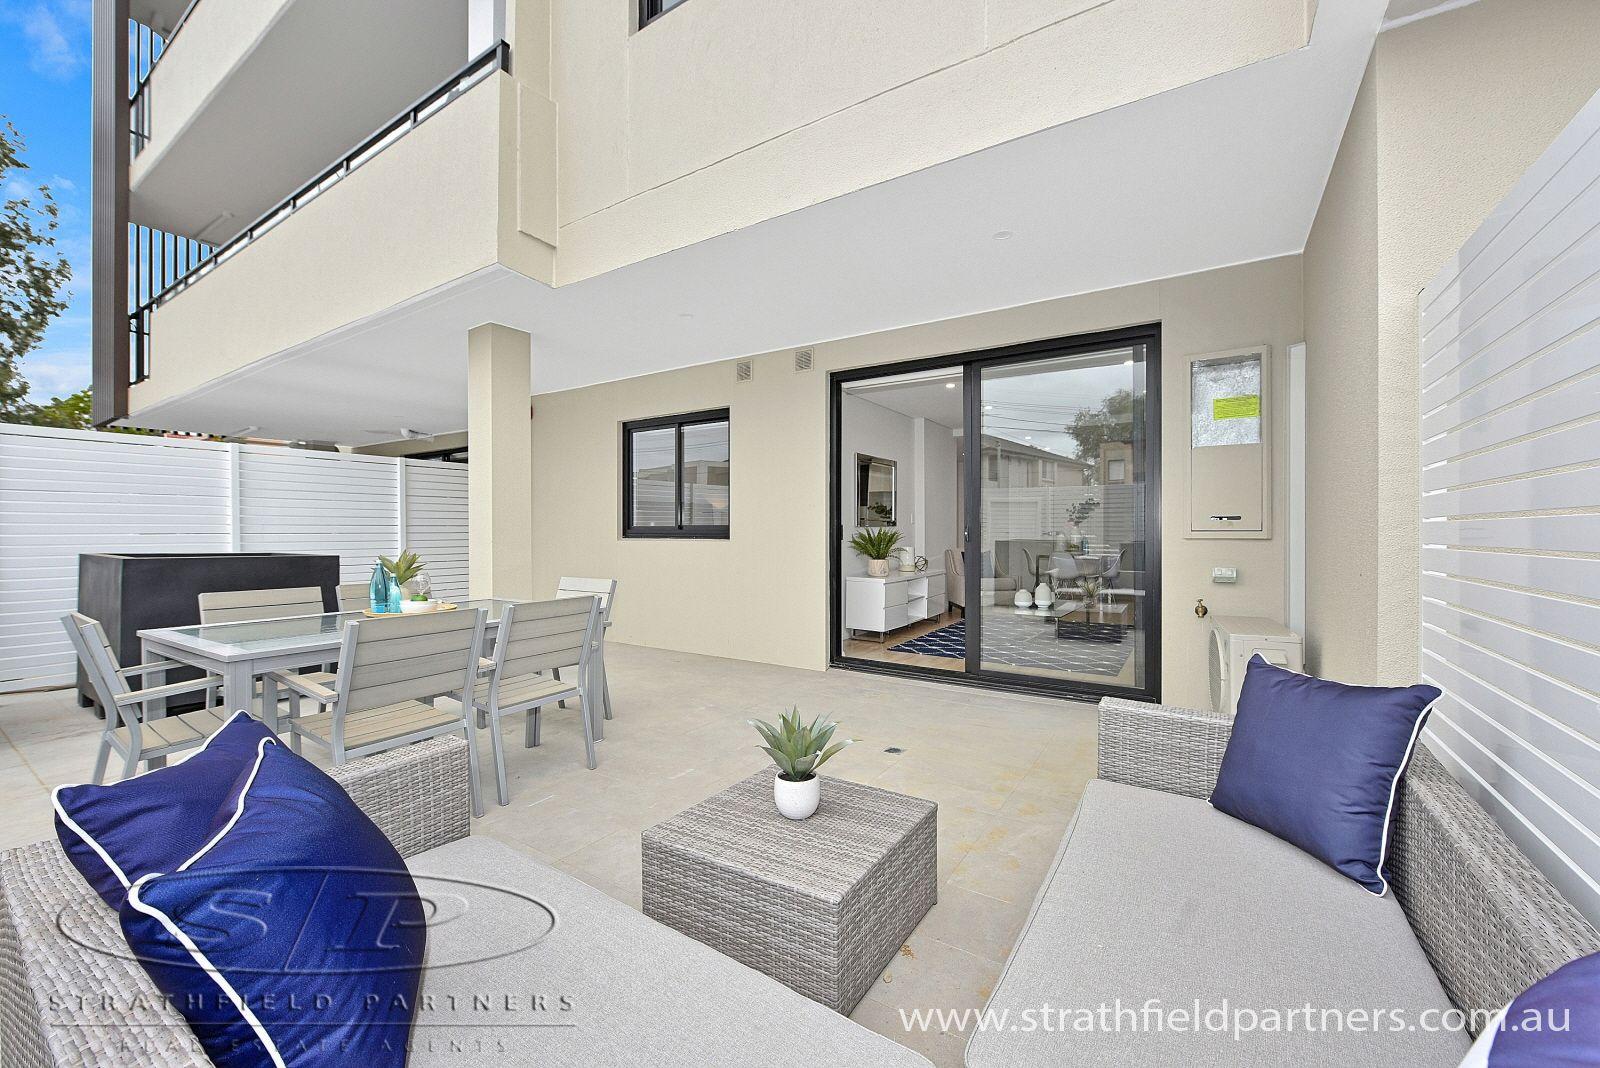 19/3 Anselm Street, Strathfield South NSW 2136, Image 1